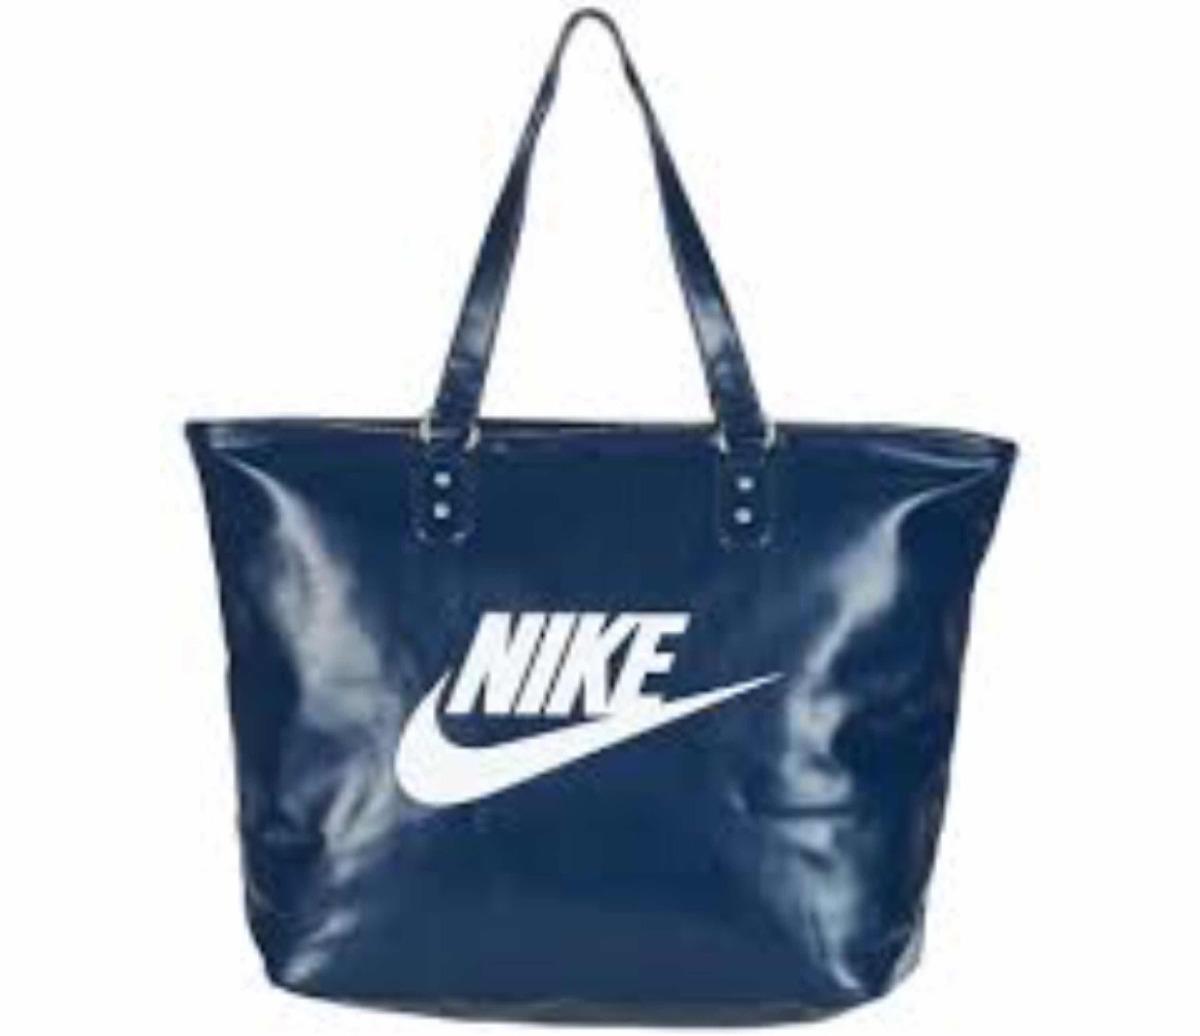 Original Bs199 Para Bolso En Dama Nike Heritage Ba4311 000 00 qSzUMVpG